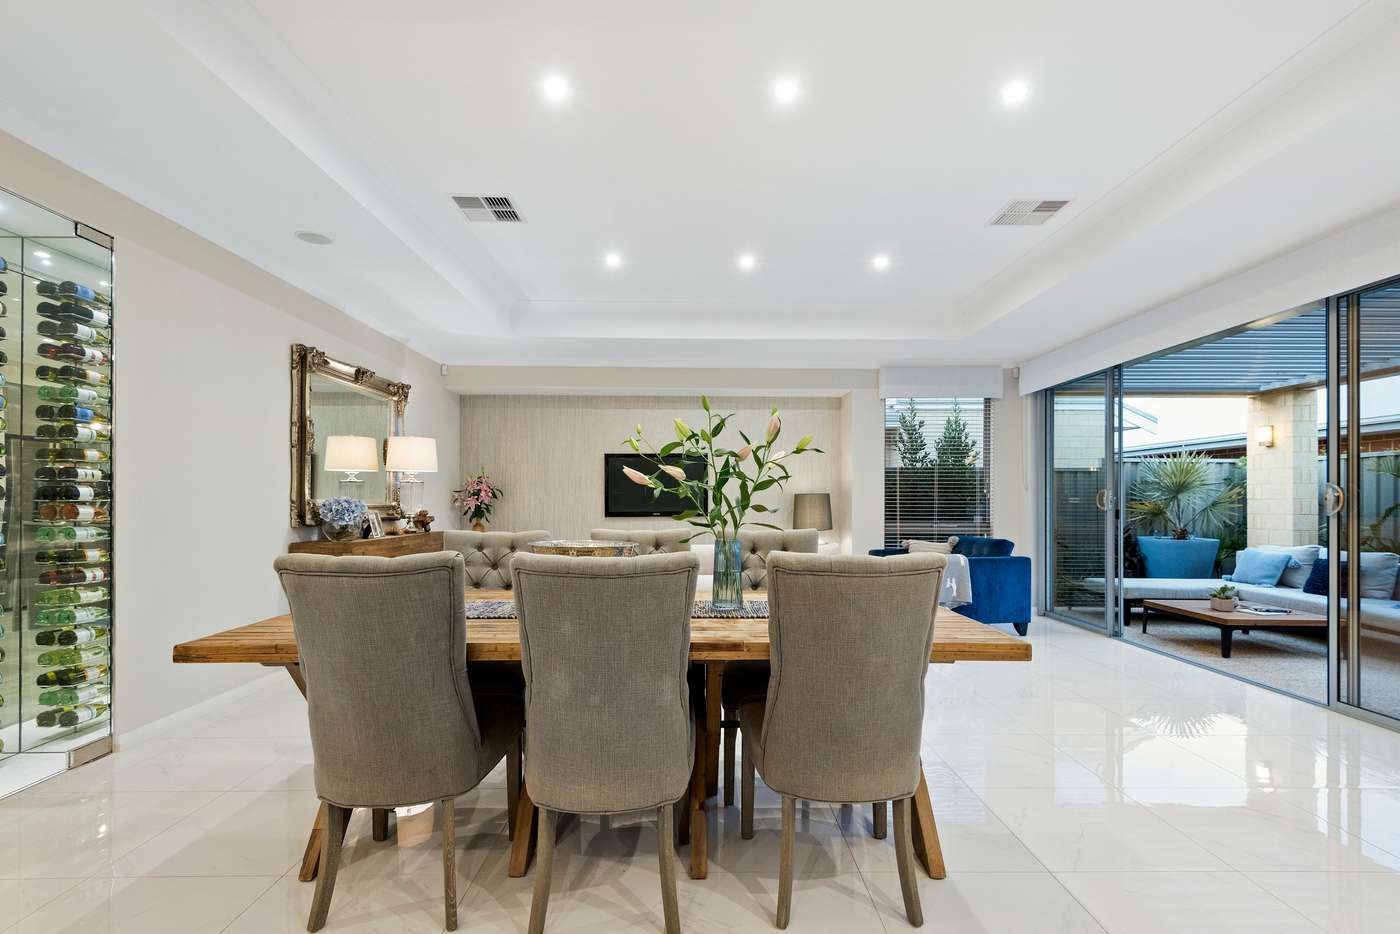 Seventh view of Homely house listing, 2 Tarong Way, Wandi WA 6167